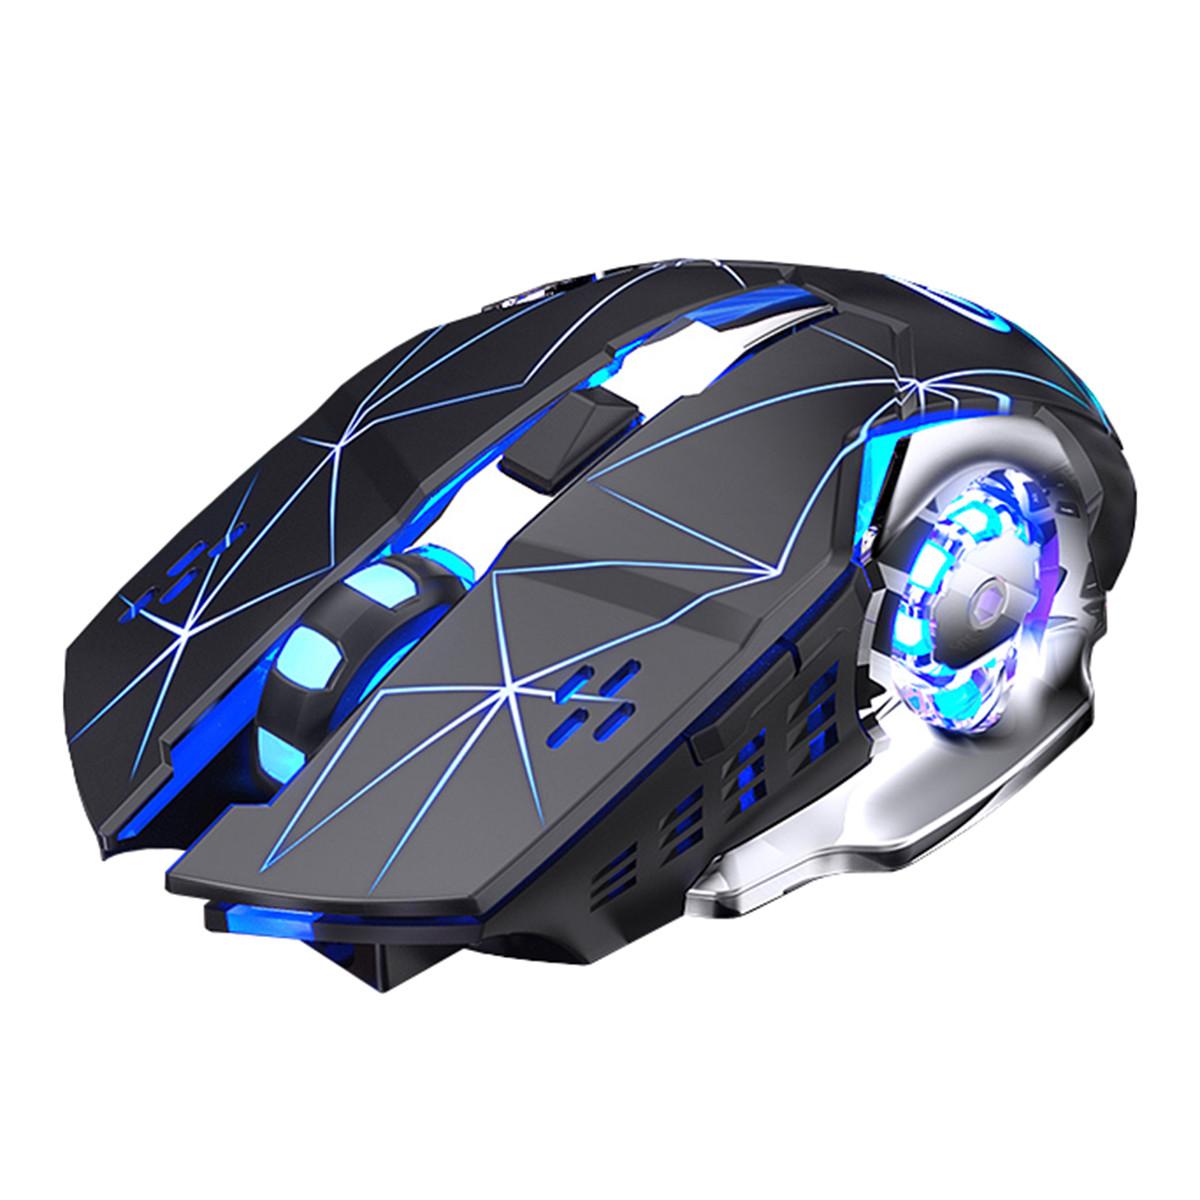 Миша бездротова SKY (A4) Black Star, акумулятор, RGB